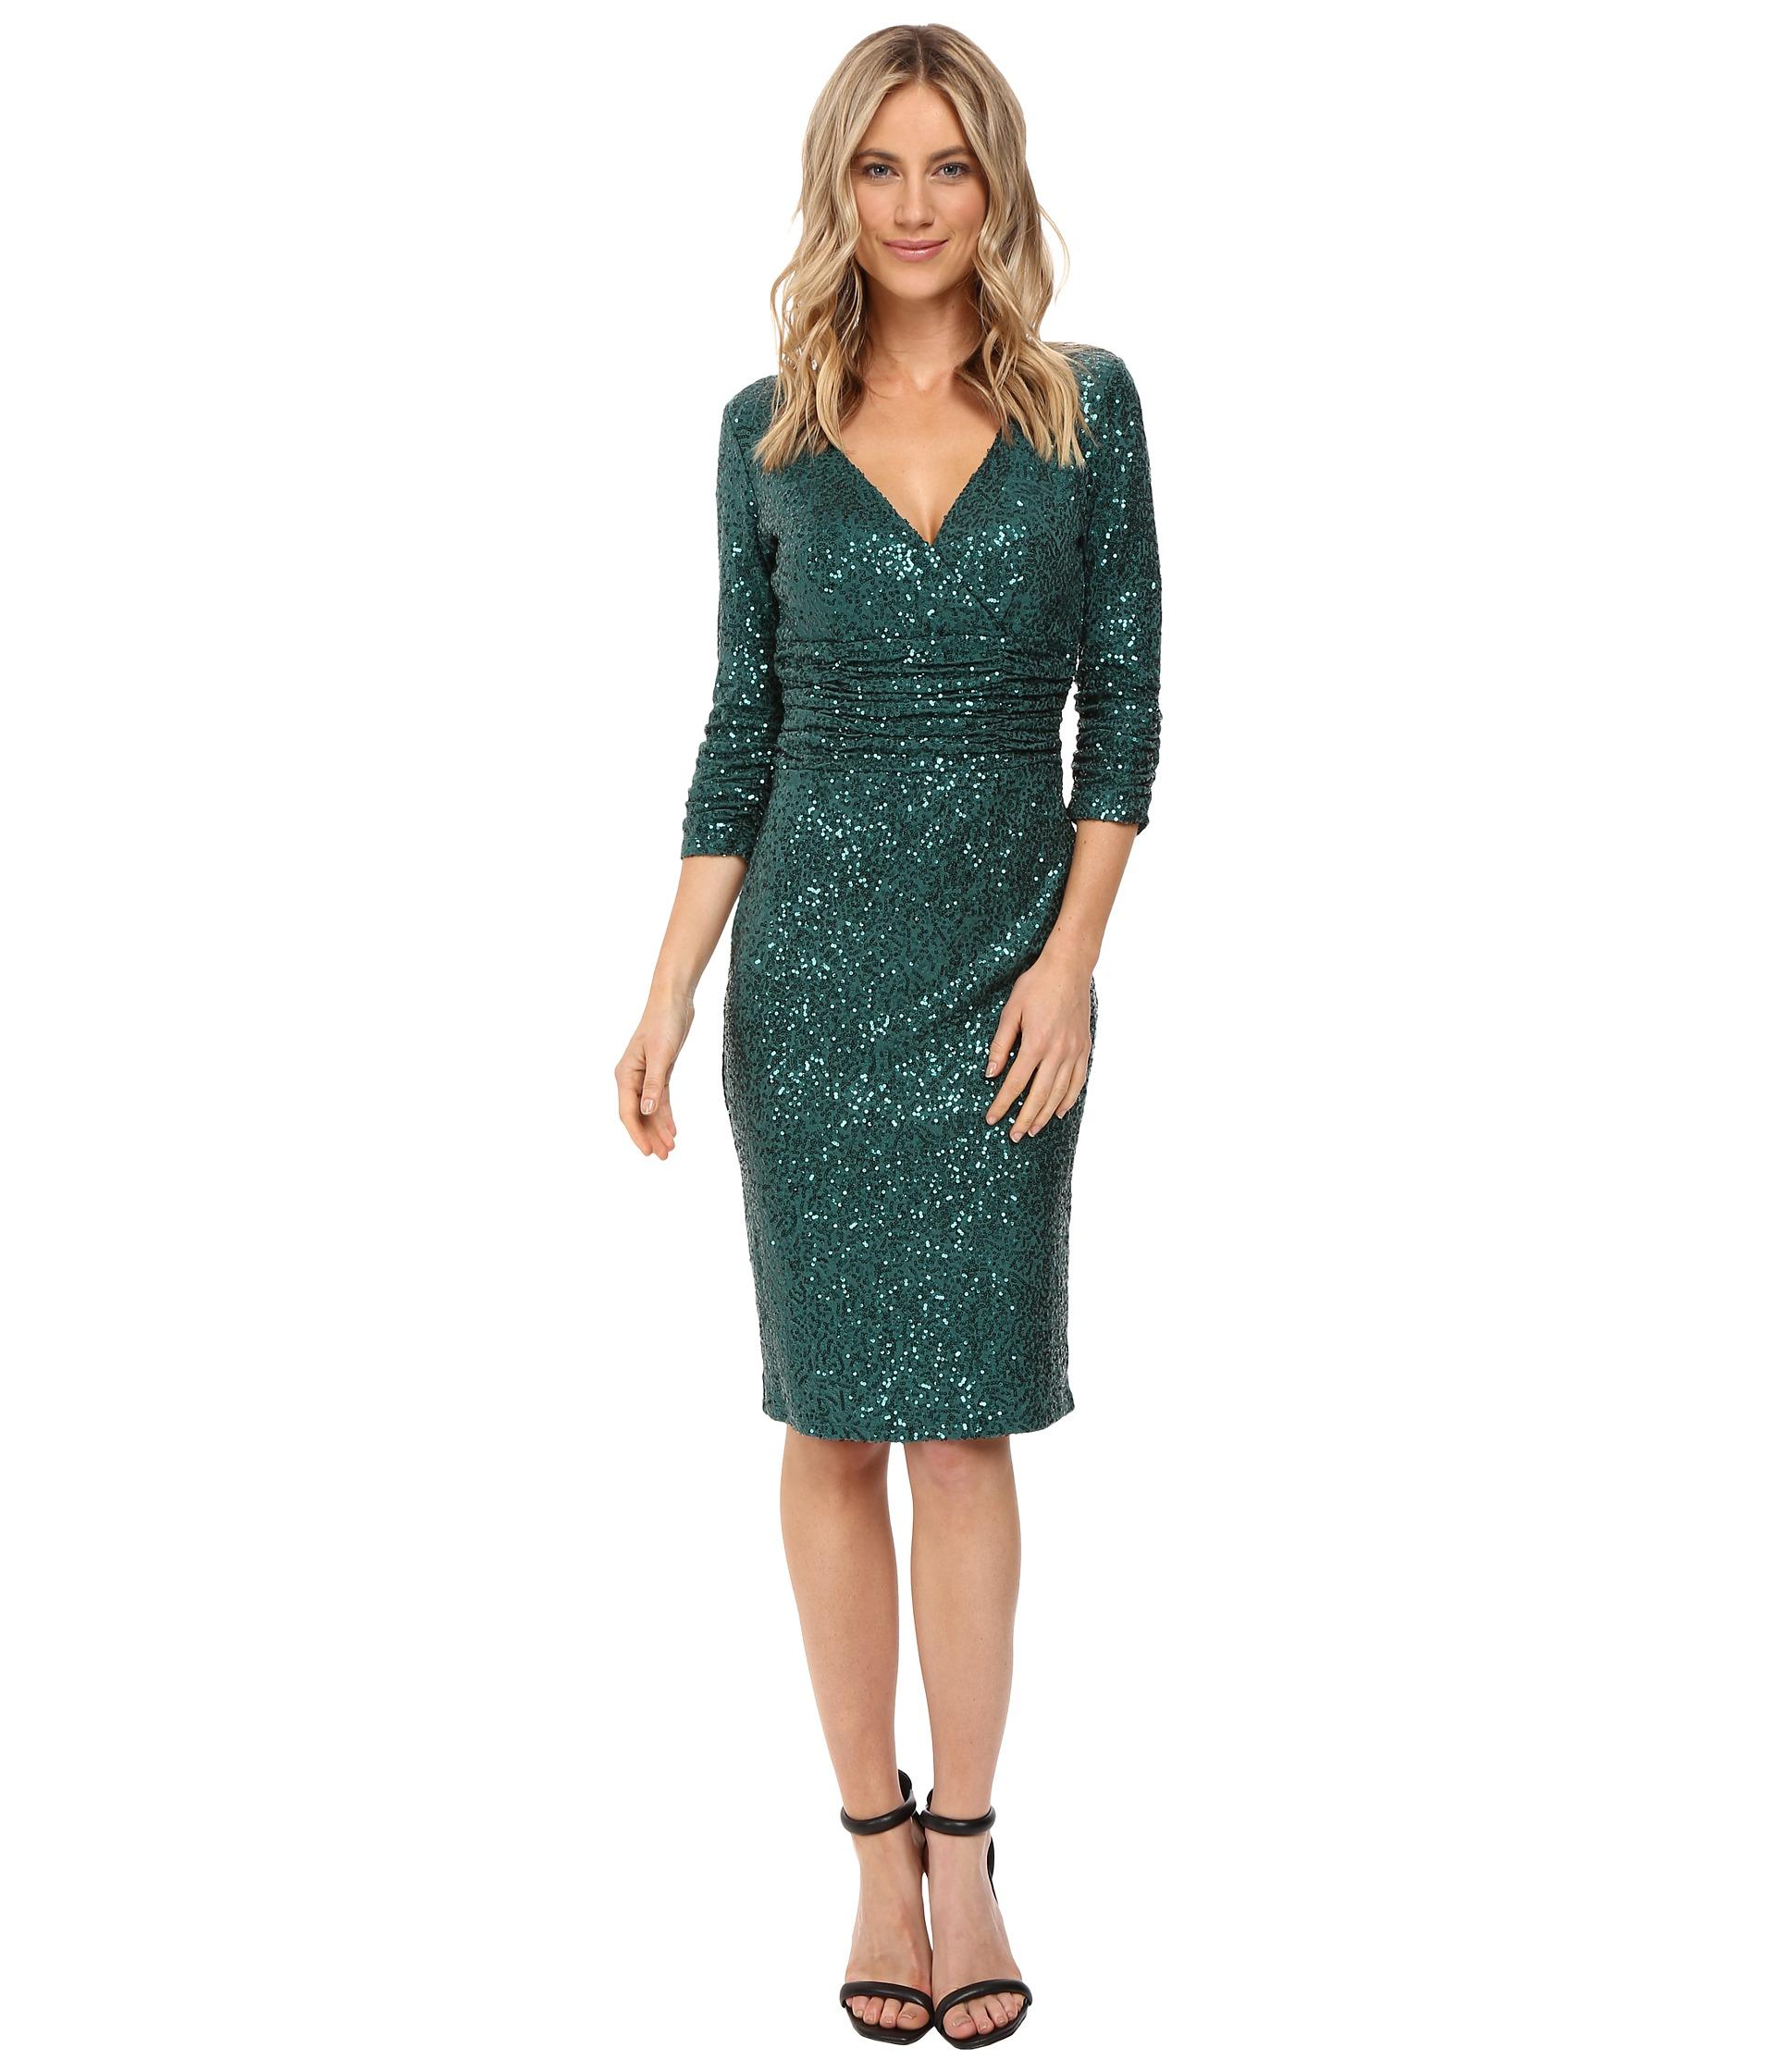 Shani Emerald: NUE By Shani Cross-Over V-Neckline Sequin Knit Dress